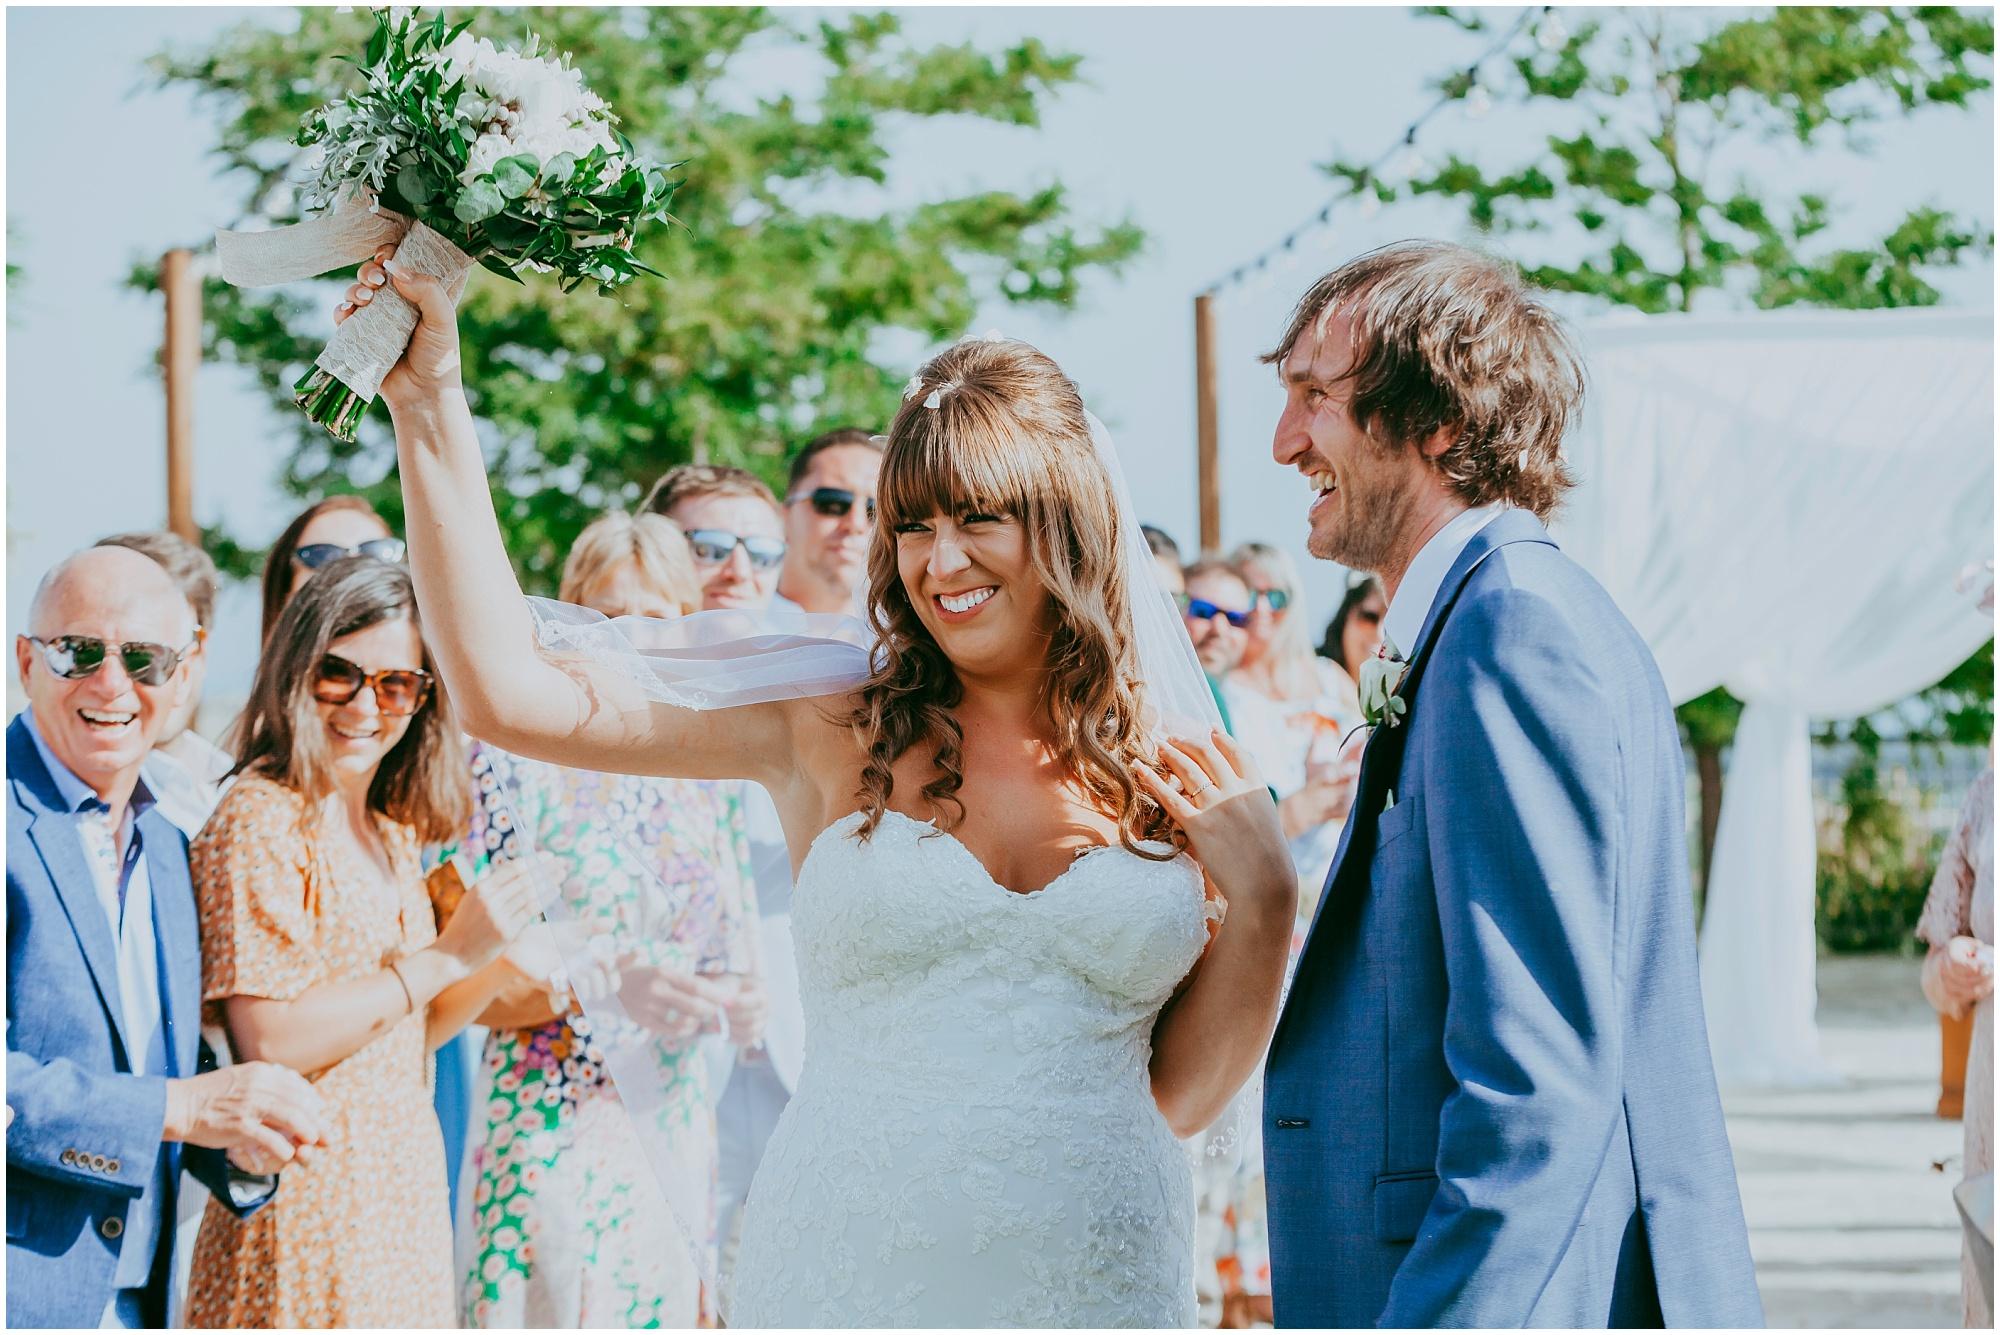 liopetro bride and groom